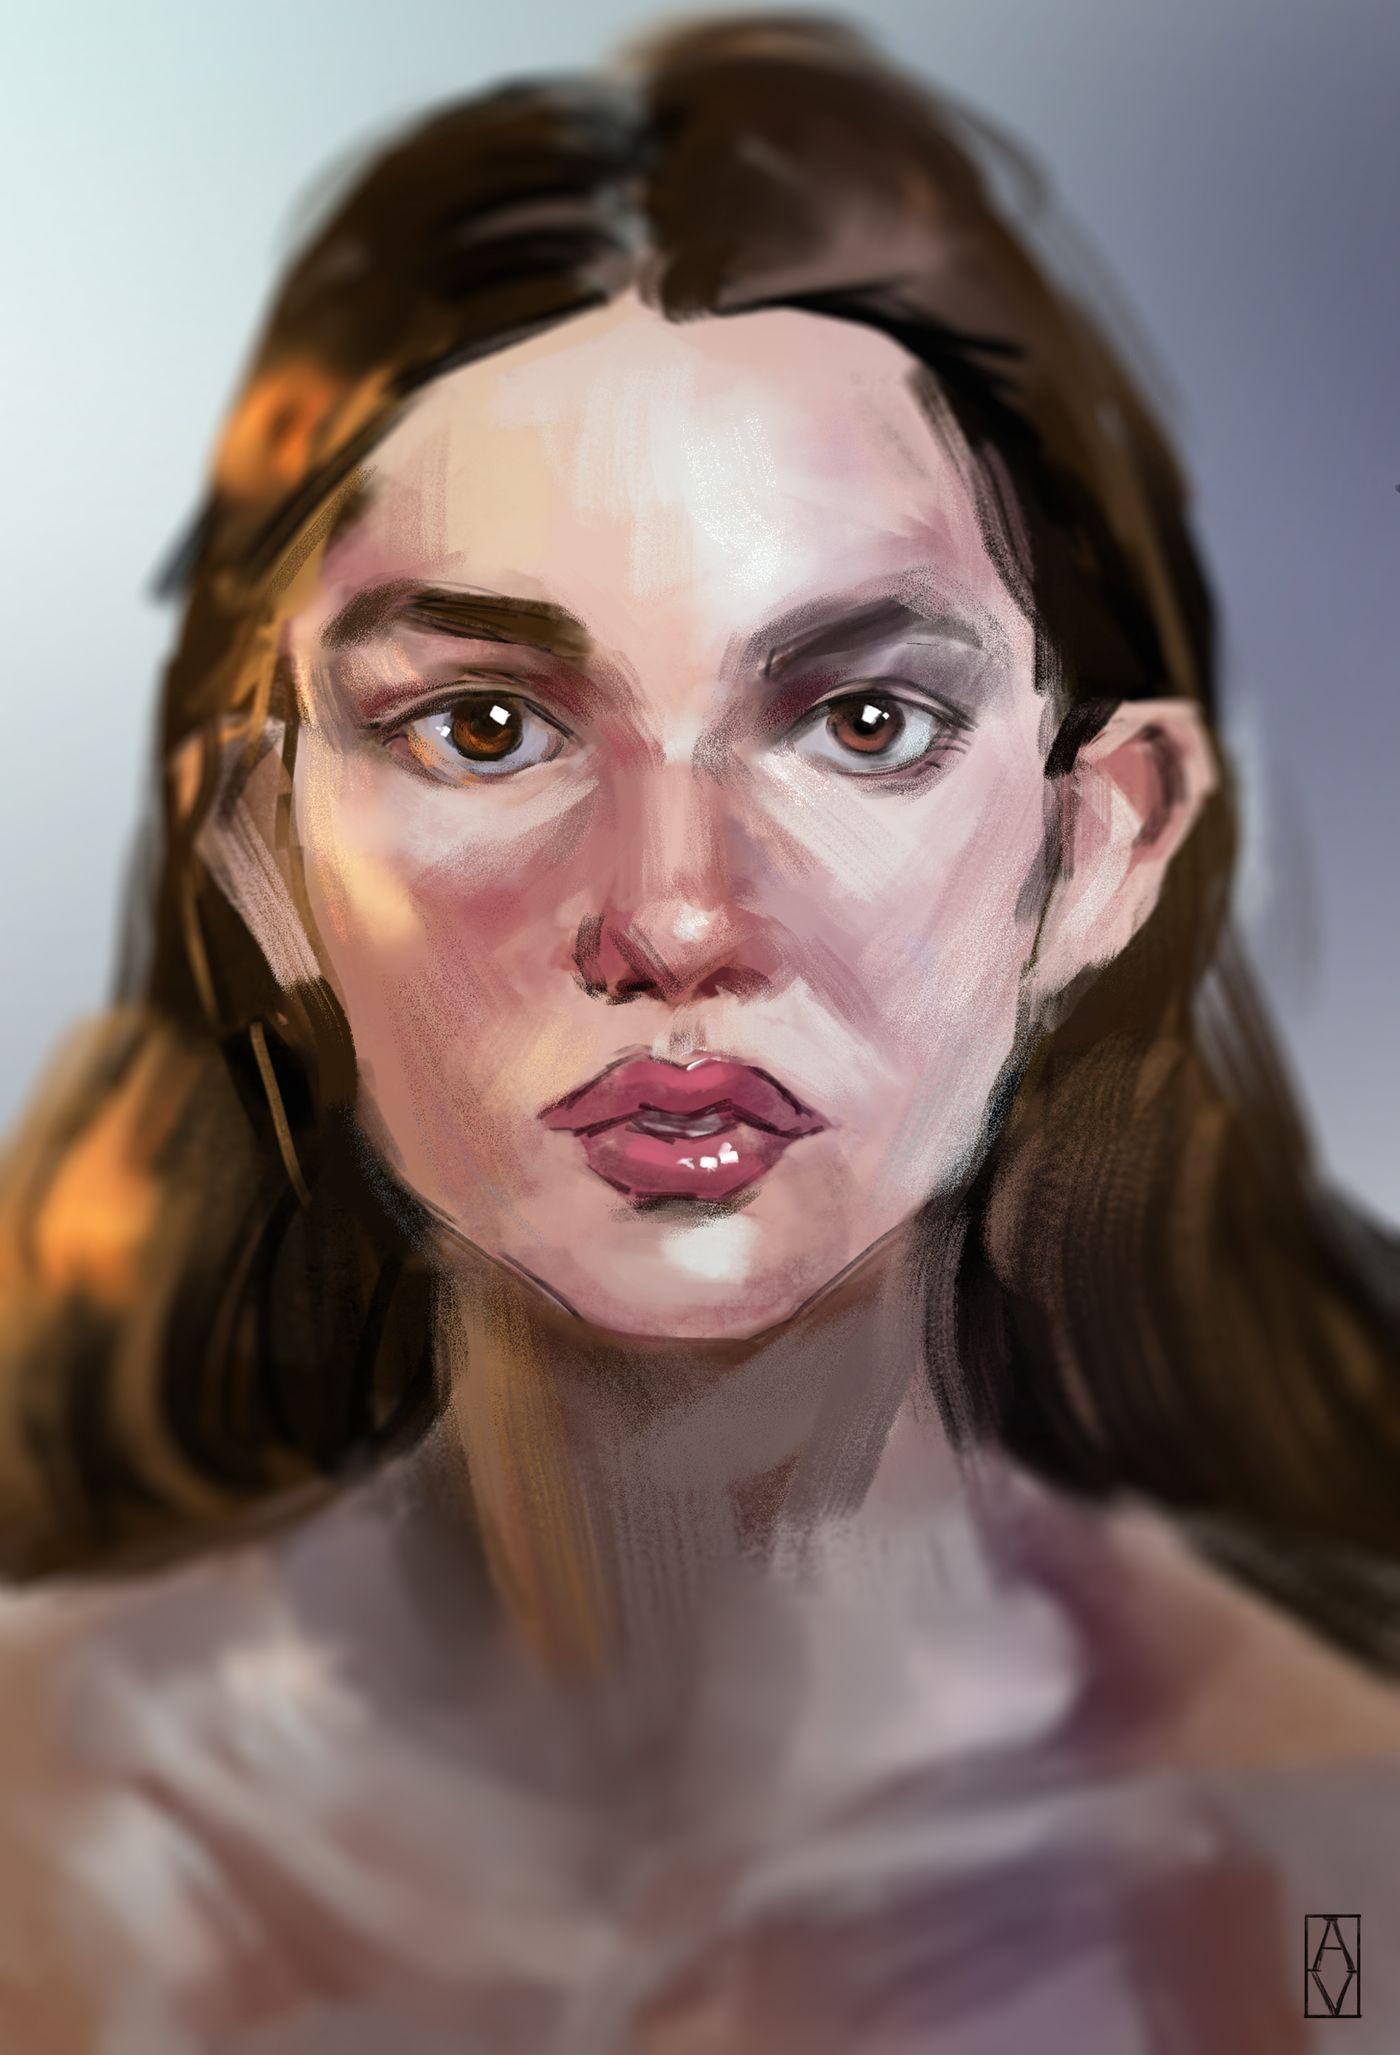 Face0501 Astridv